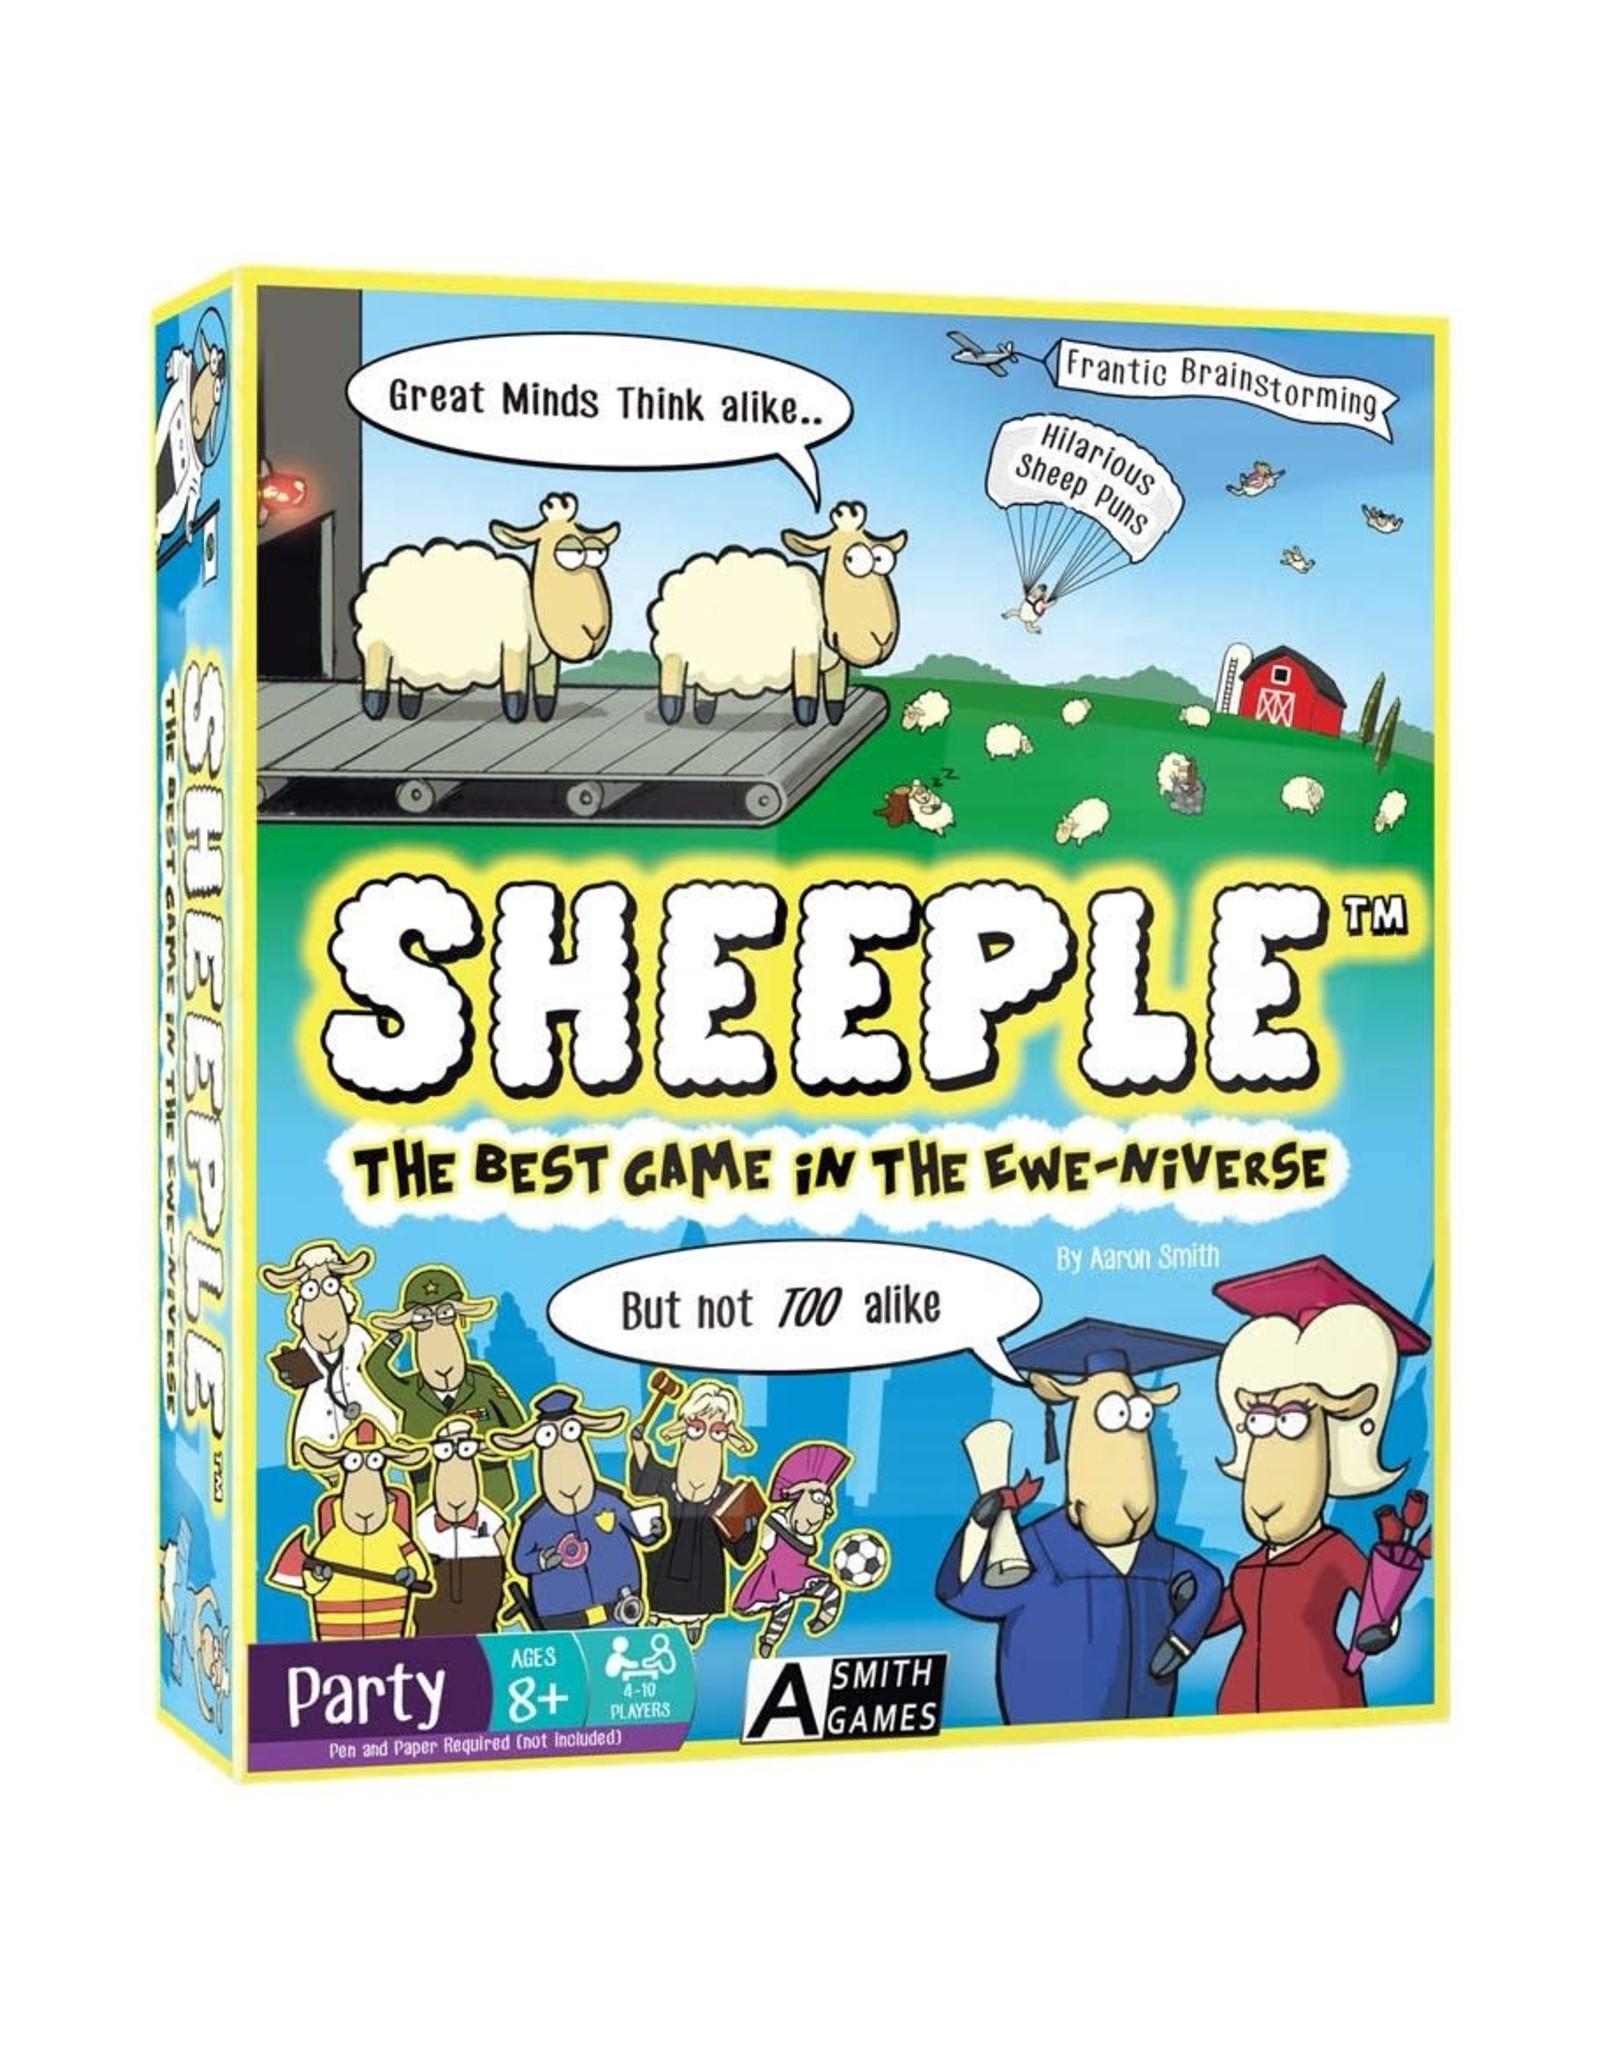 SHEEPLE: Best Game In The Ewe-niverse